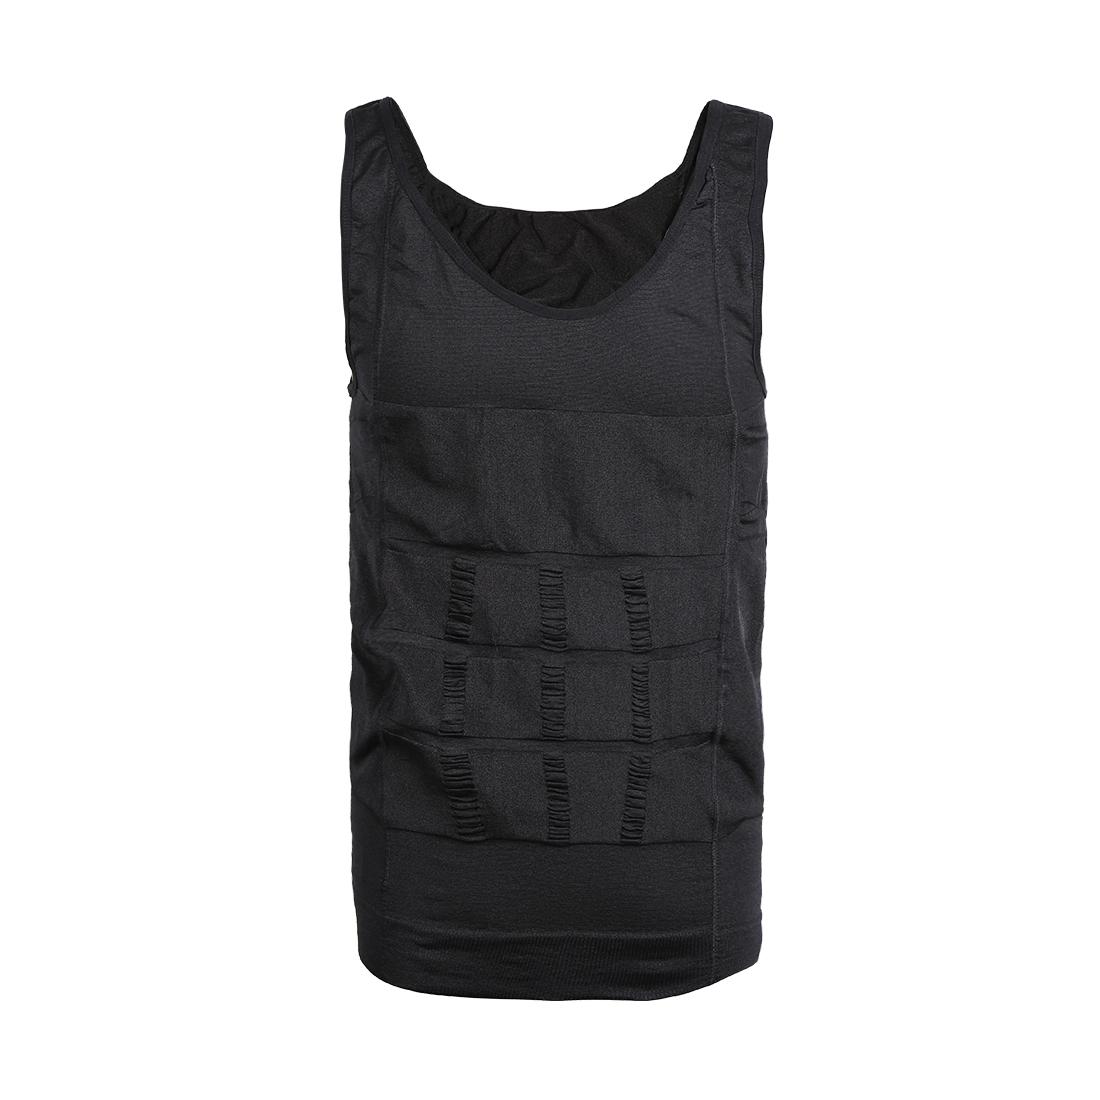 Men Compression Slimming Body Tummy Waist Shapewear Tank Top Black Large